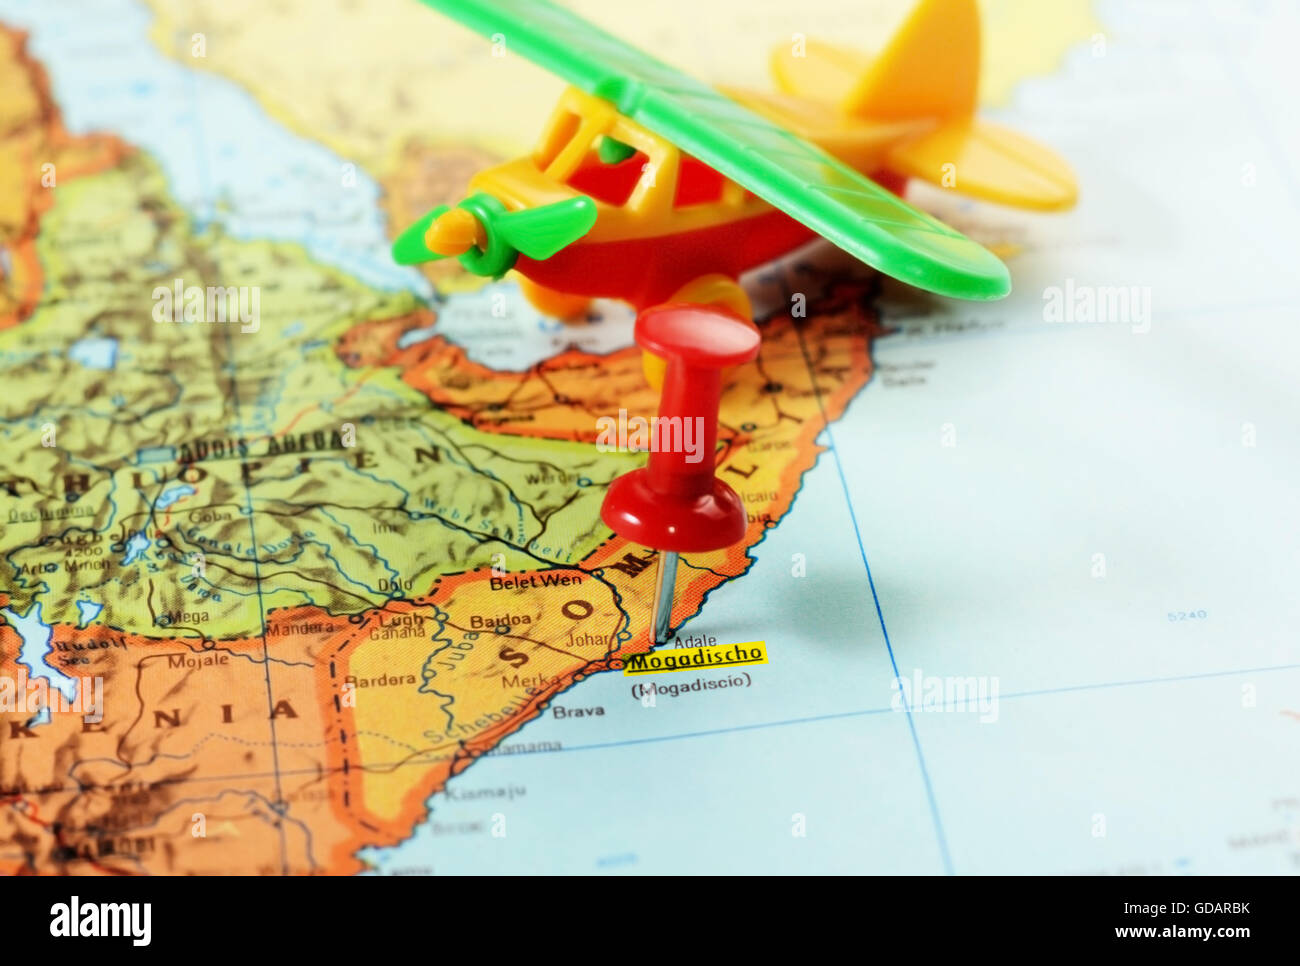 Mogadishu Africa Map.Close Up Of A Red Pushpin On A Map Of Mogadishu Somalia